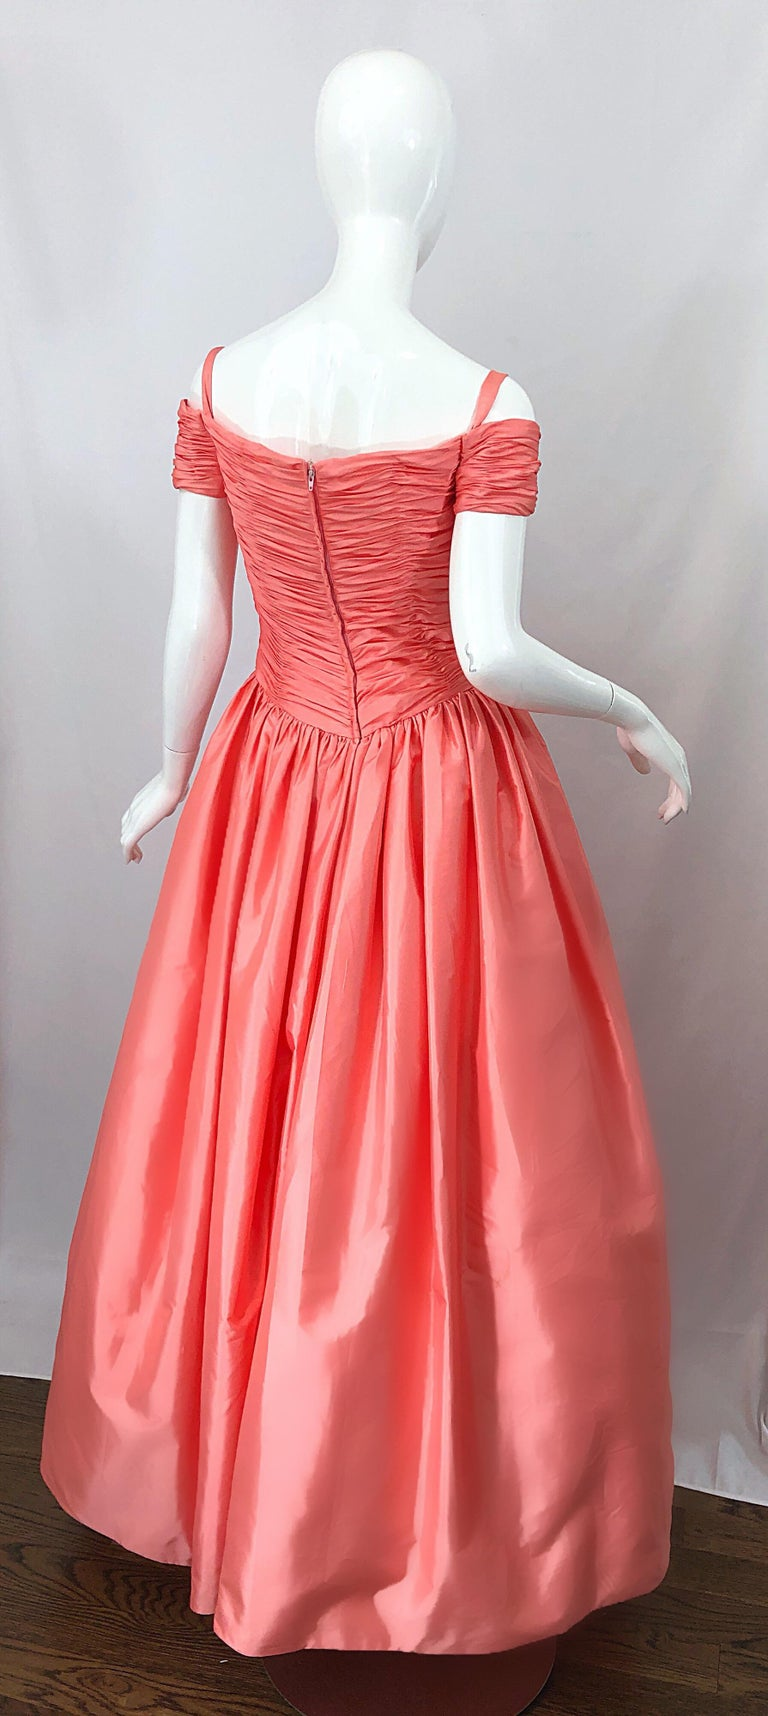 1980s Chris Kole Coral Pink Size 6 Off the Shoulder Silk Taffeta Vintage Gown For Sale 1